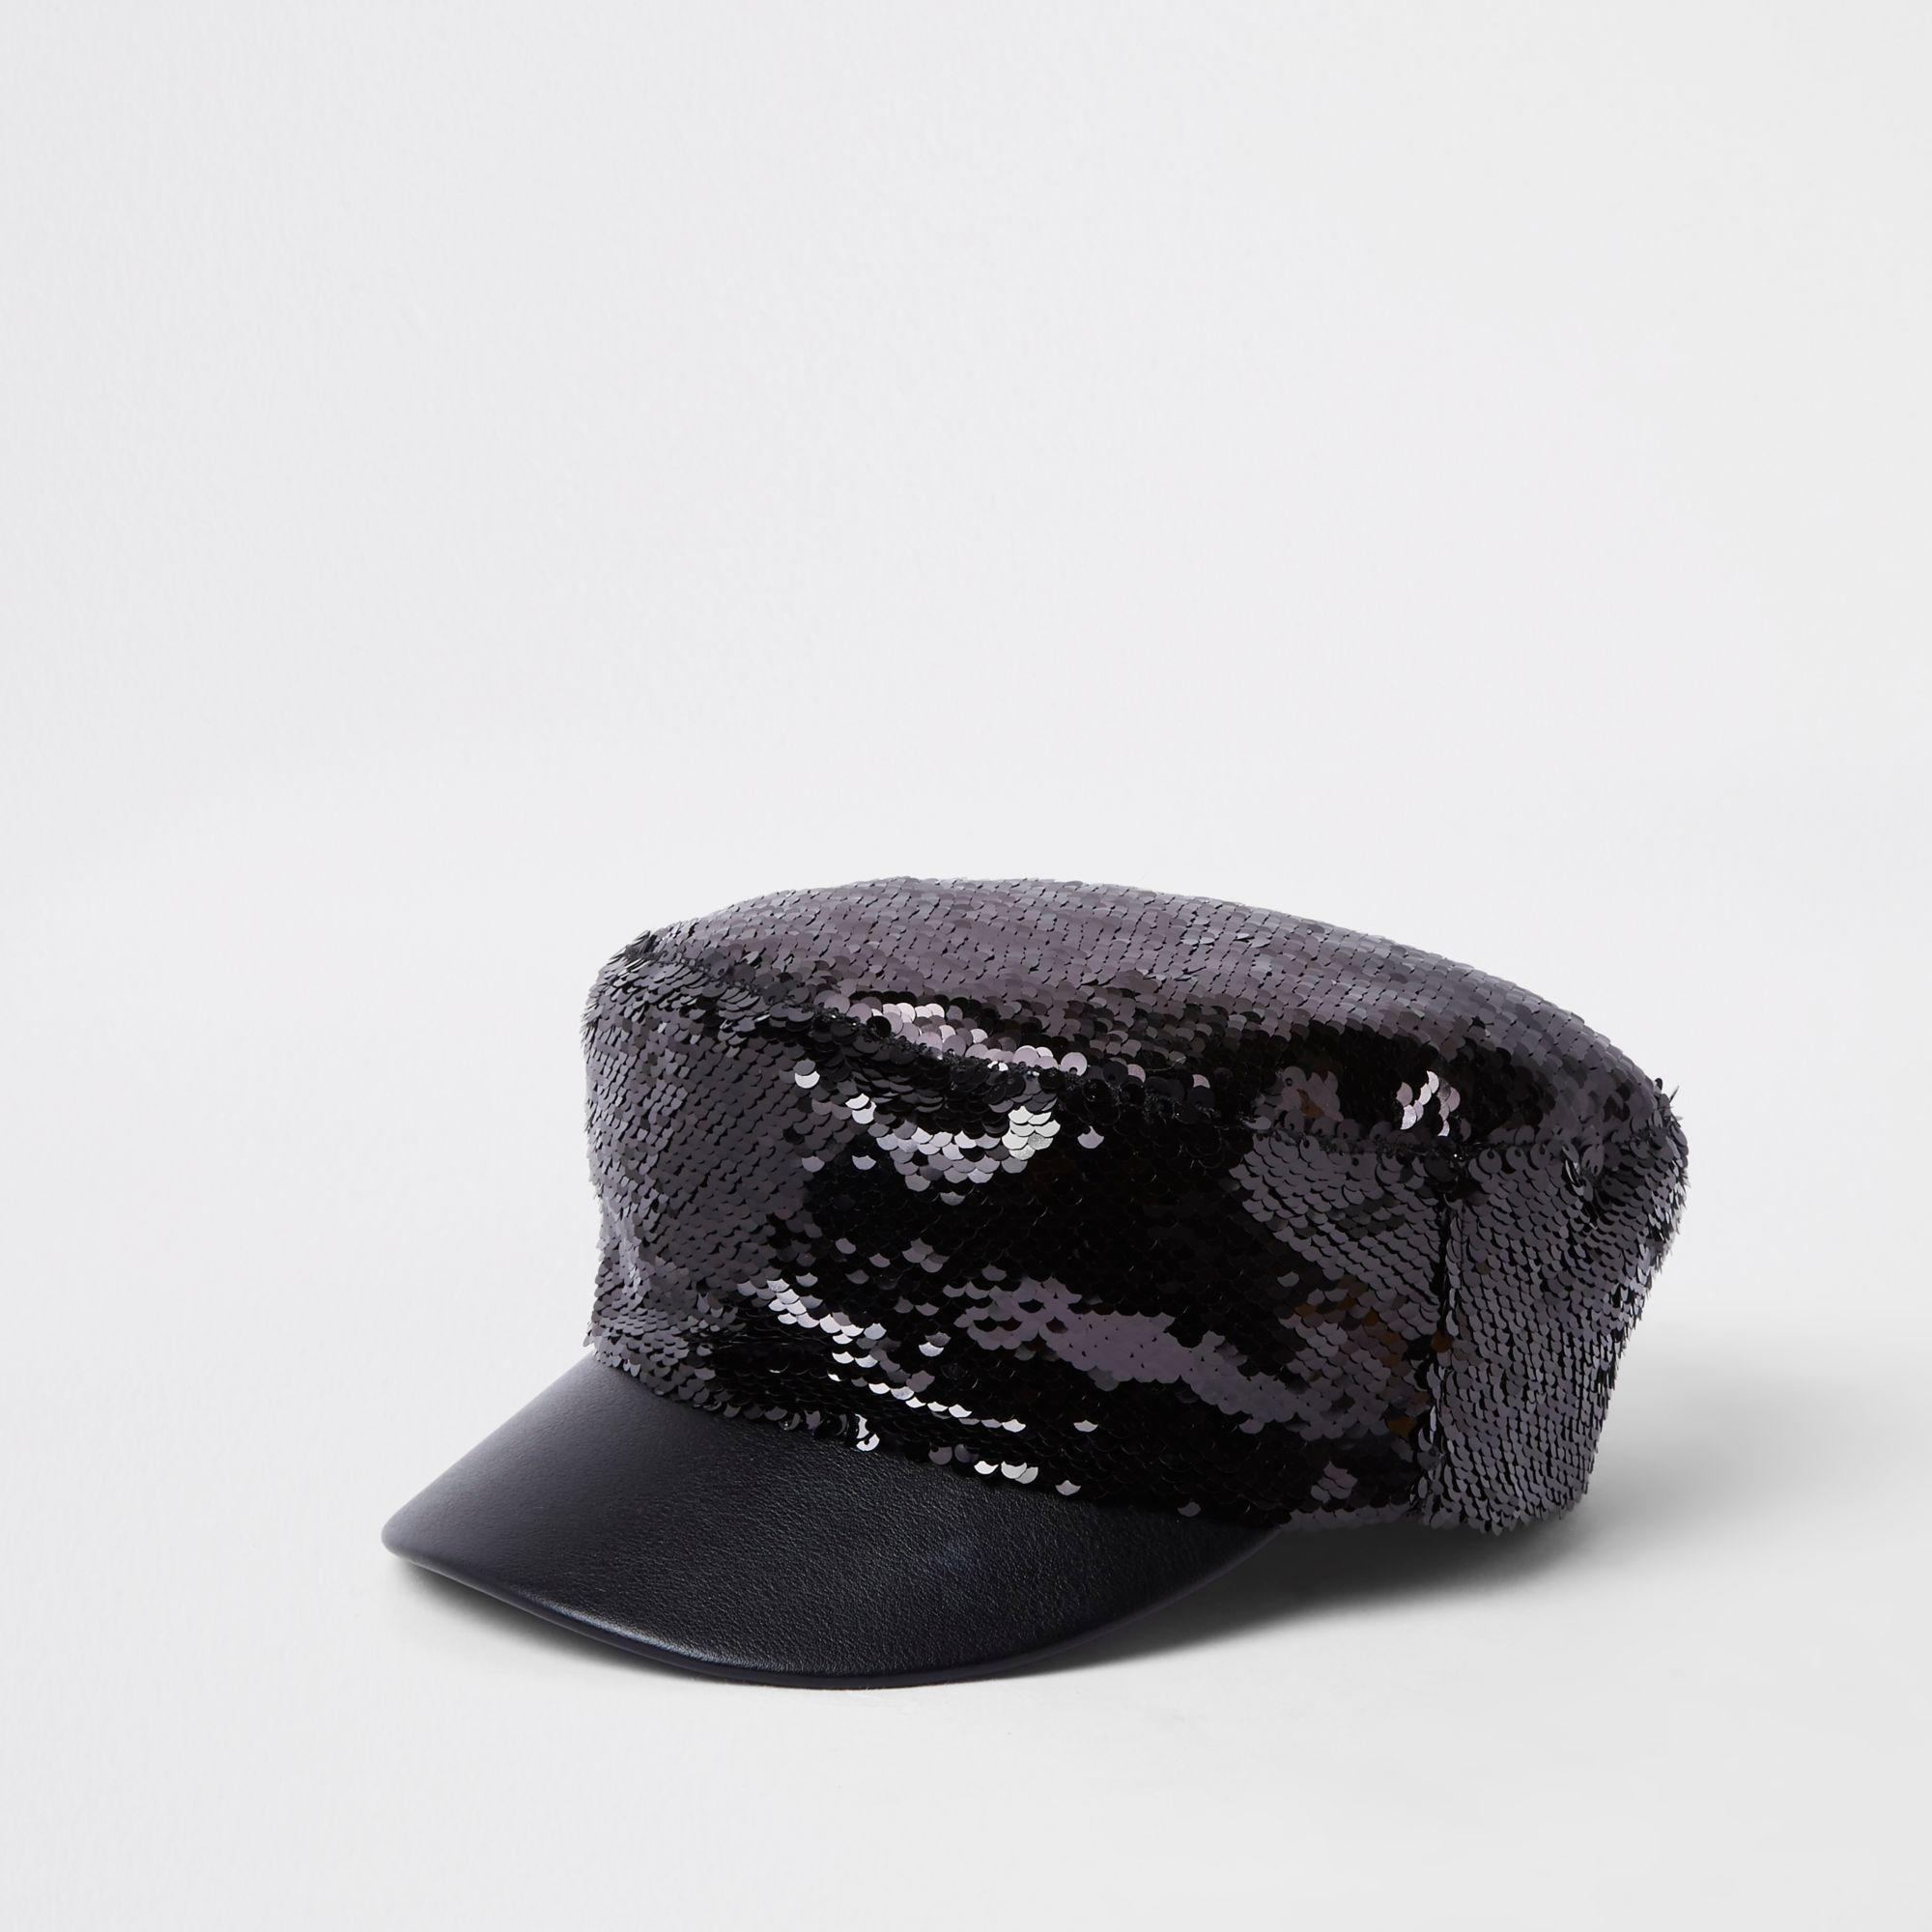 c51a479b8 River Island Sequin Baker Boy Hat in Black - Lyst